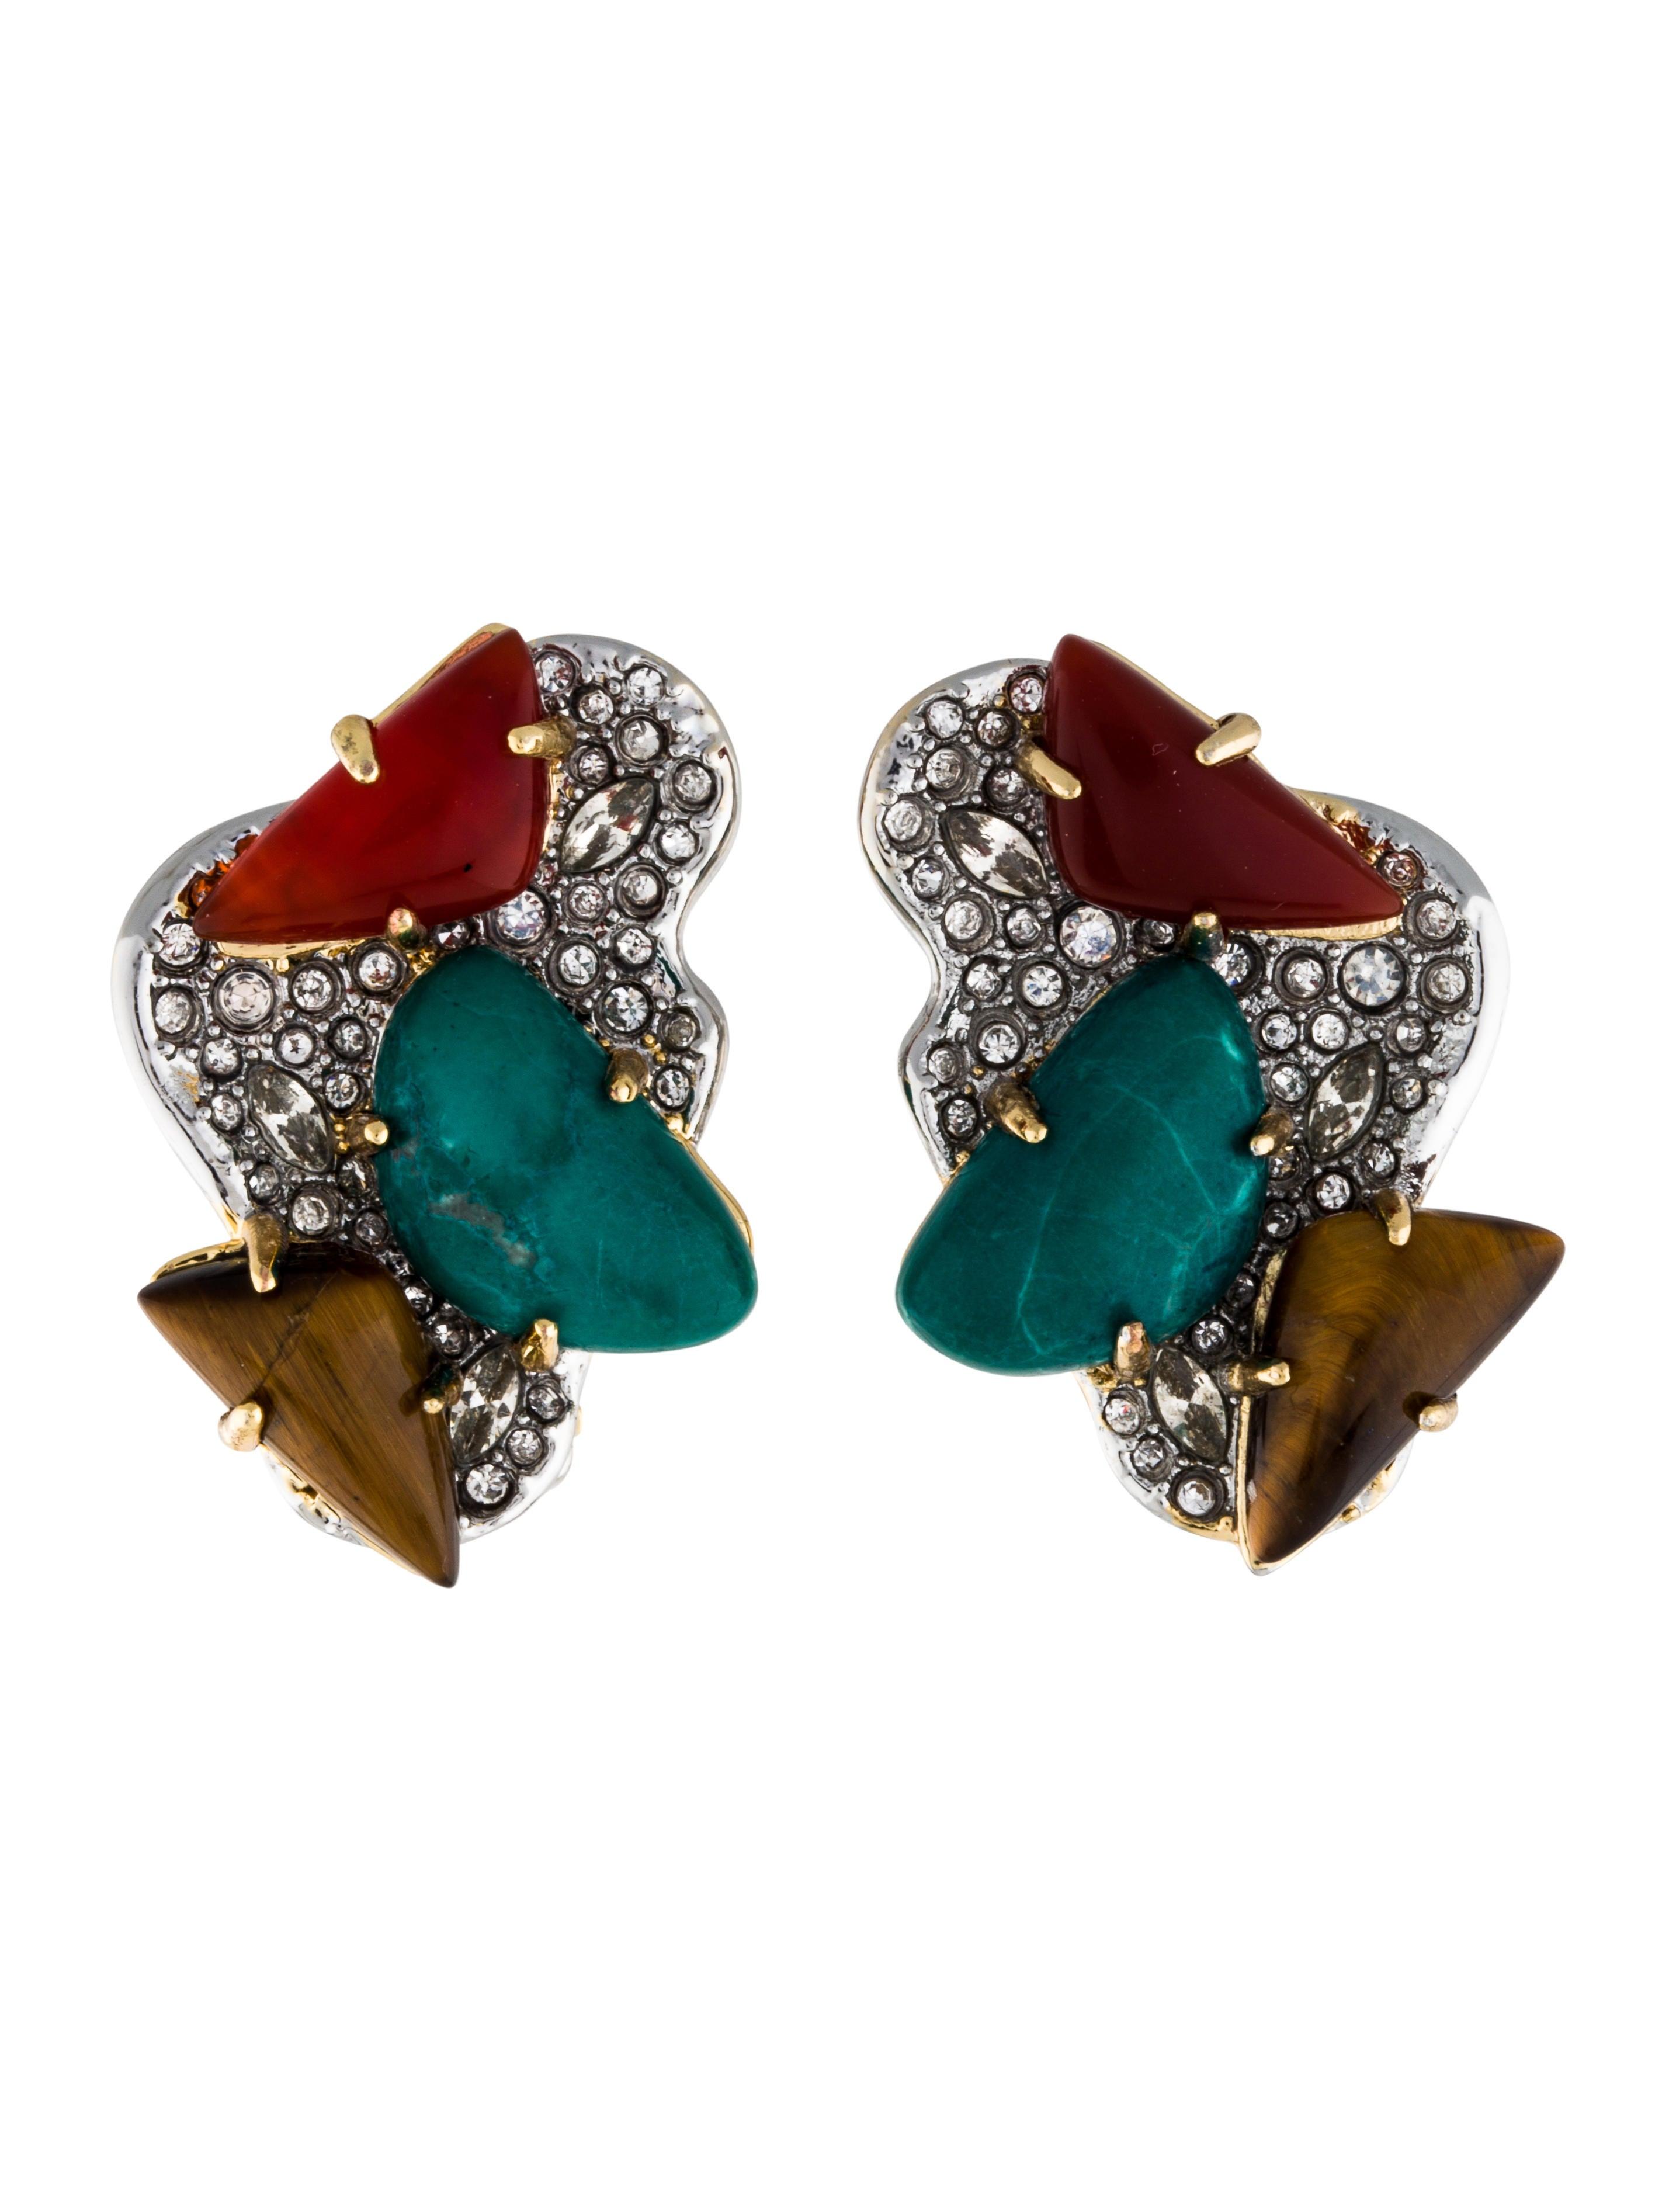 Alexis Bittar Roxbury Cluster Clip Earring i2tr4UQjMI